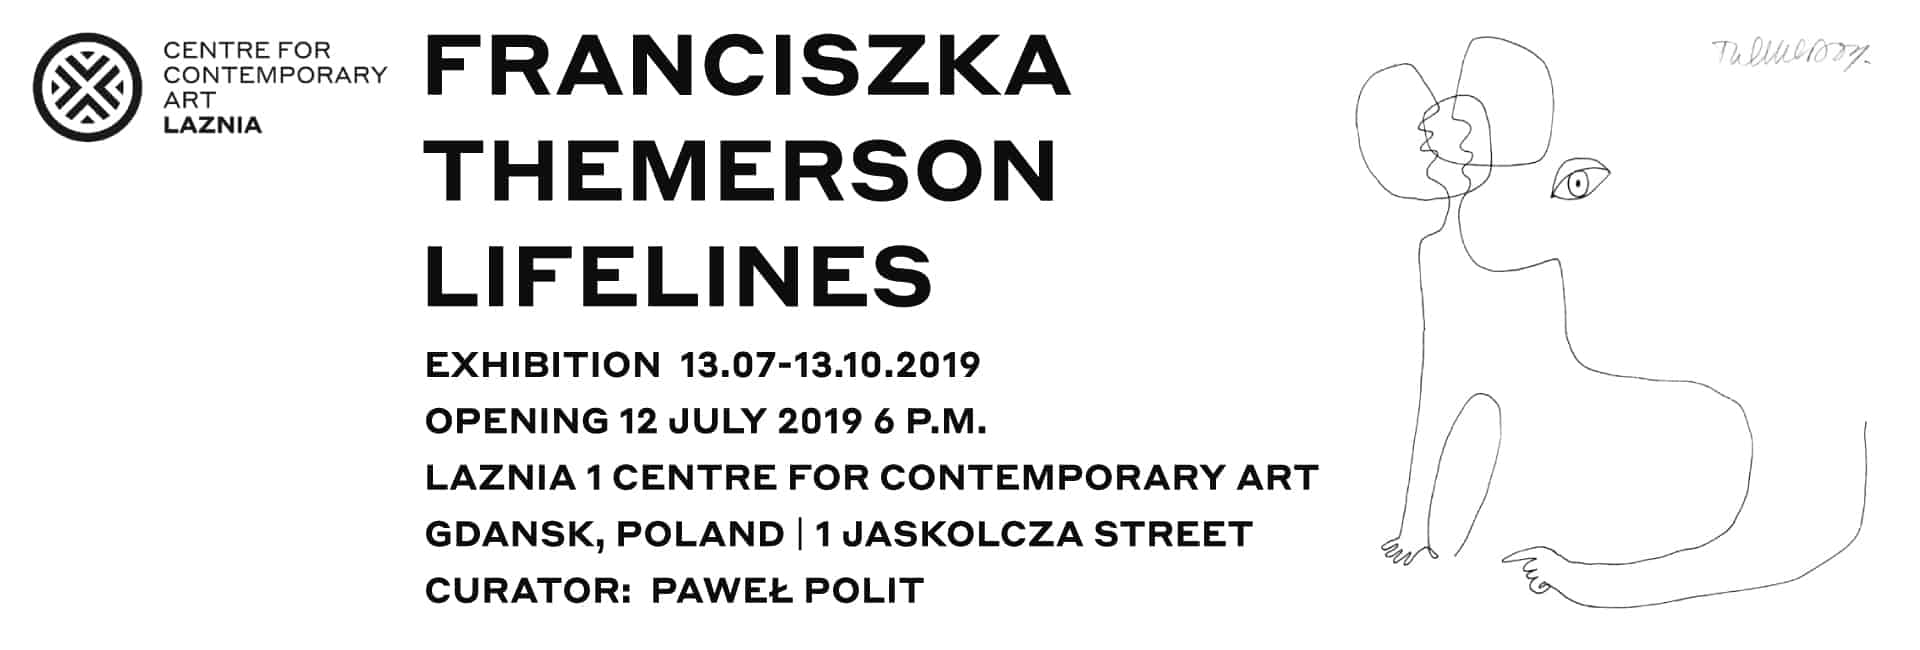 franciszka themerson baner exhibition